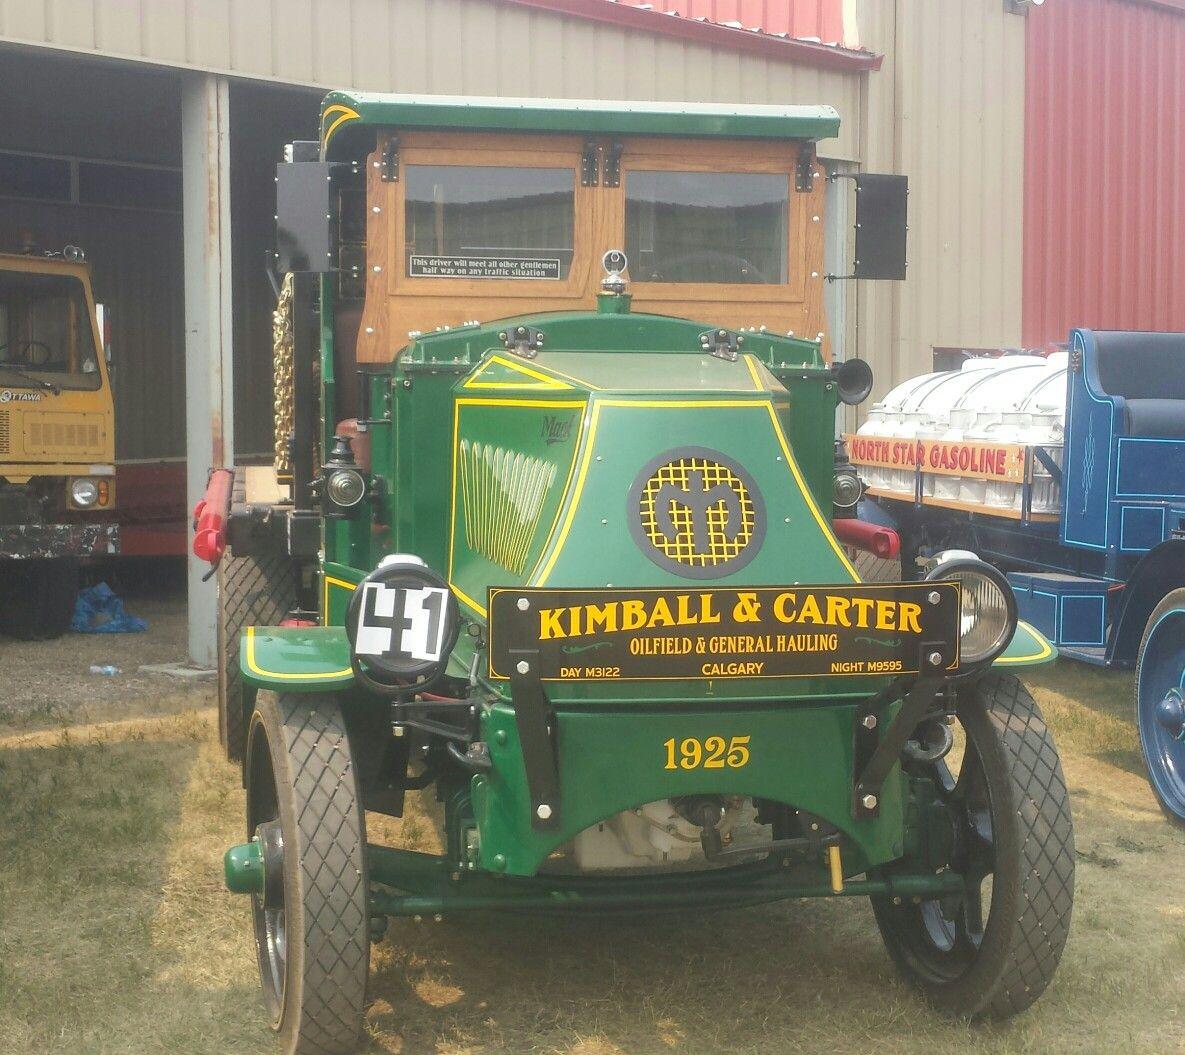 Kimble &carter Calgary ab 1925 mack. (With images